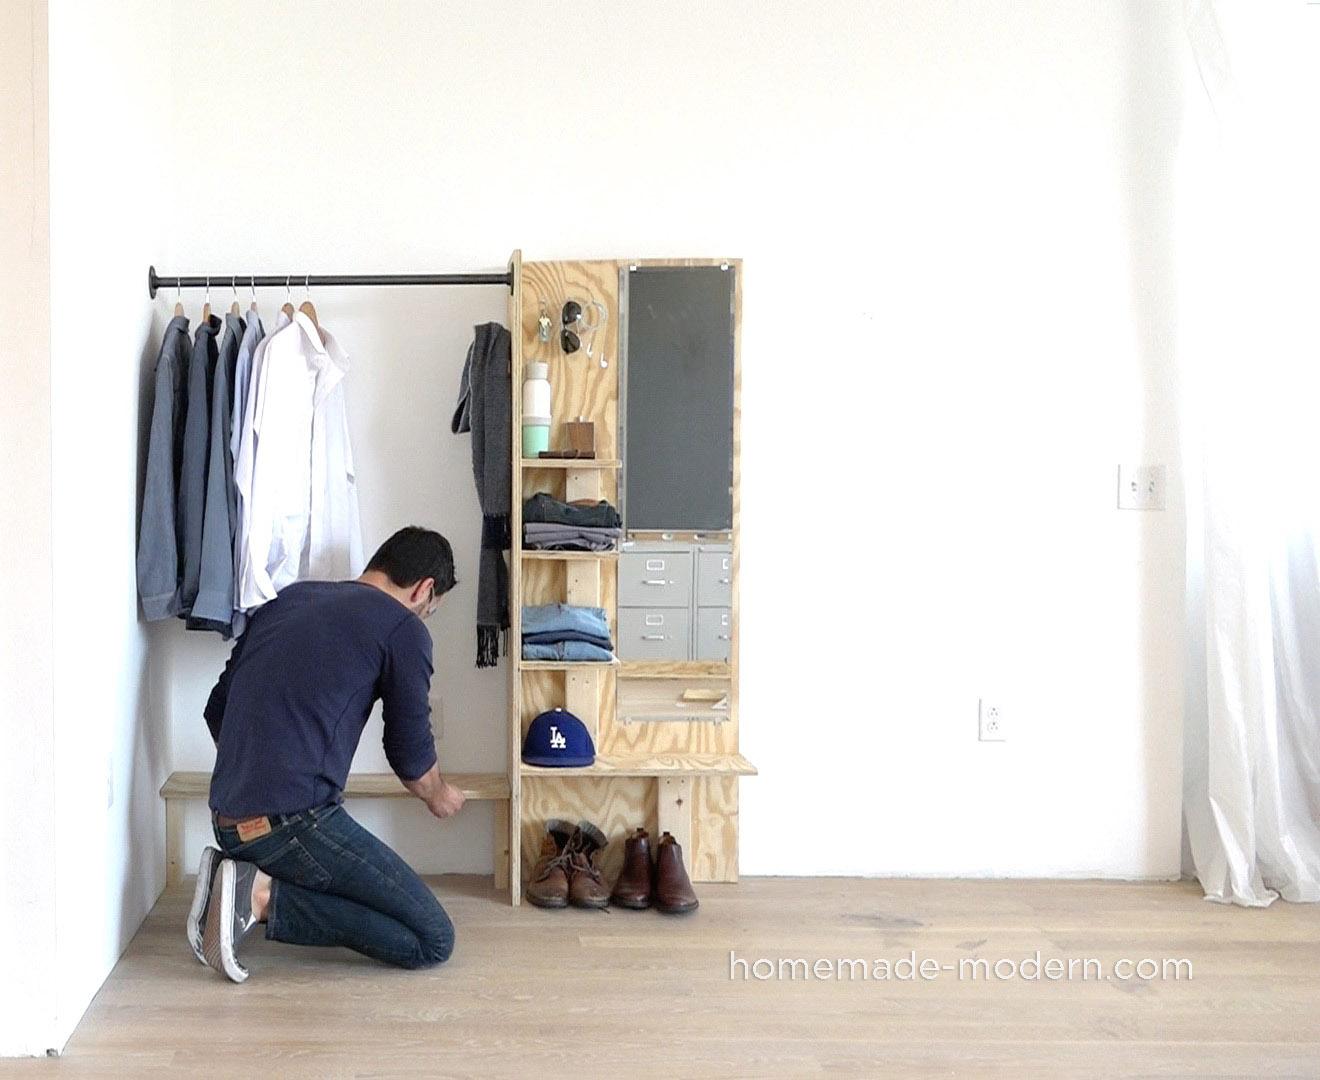 Homemade modern ep98 diy closet organizer for Over wardrobe storage